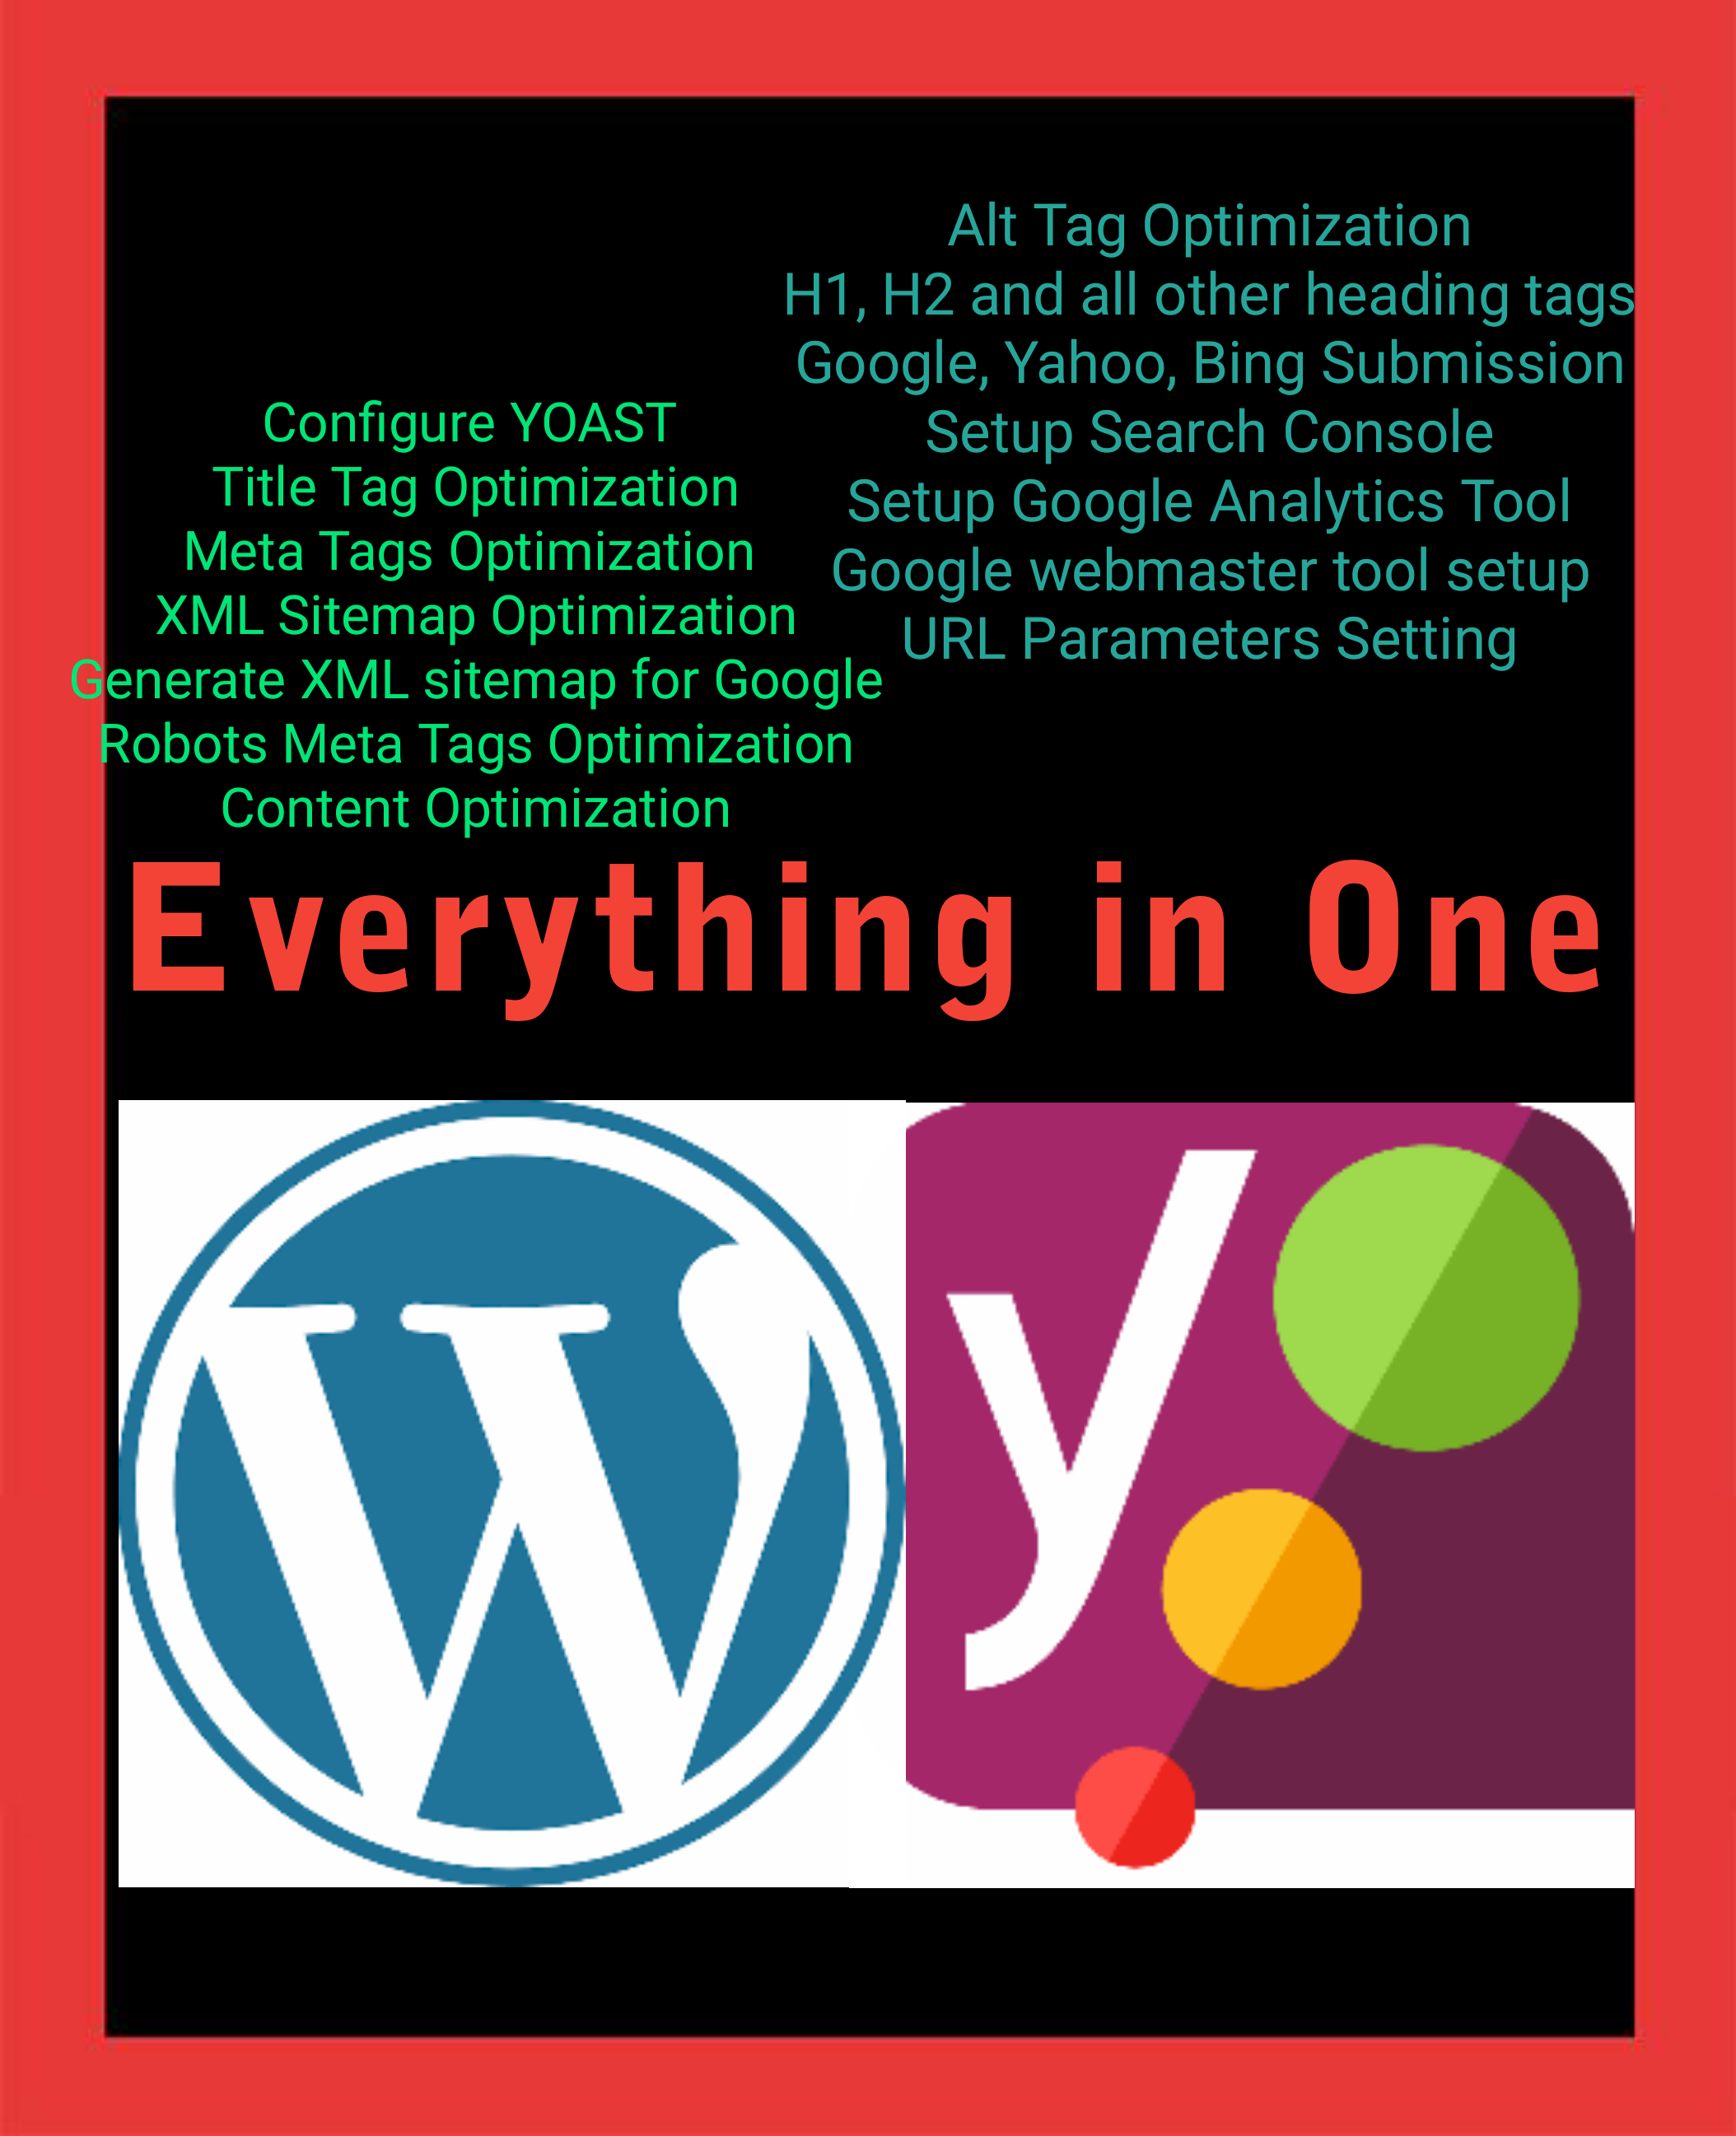 install and setup wordpress yoast SEO and do onpage optimization